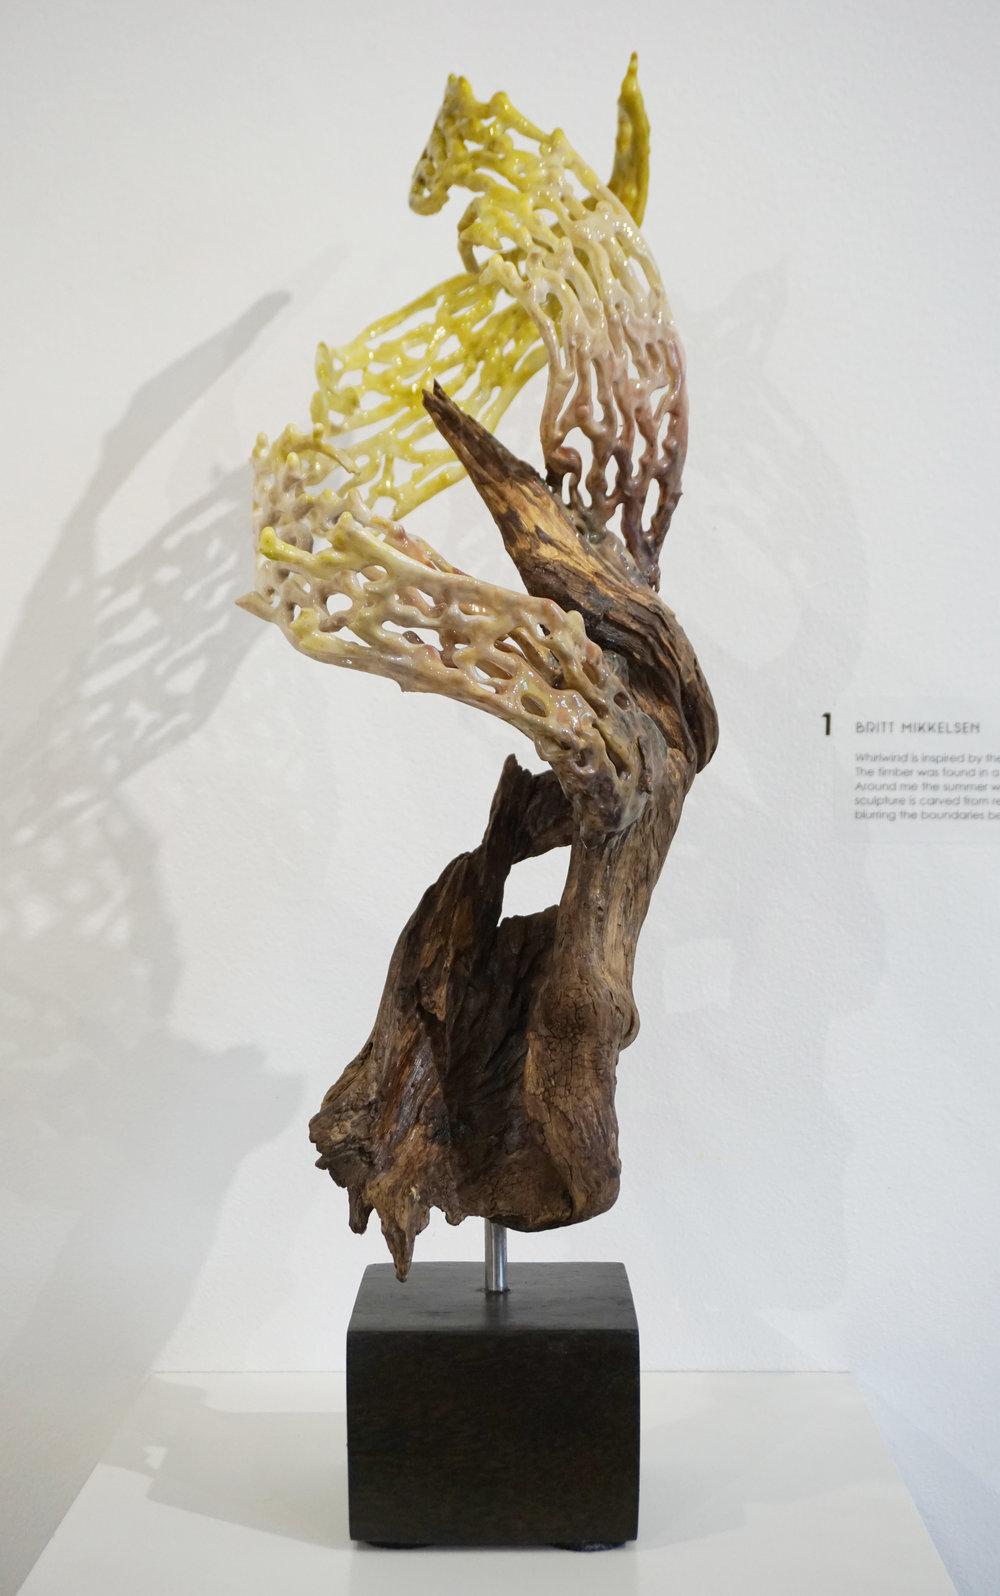 1. Britt Mikkelsen,  Whirlwind , Driftwood, recycled acrylic, resin $1,450,